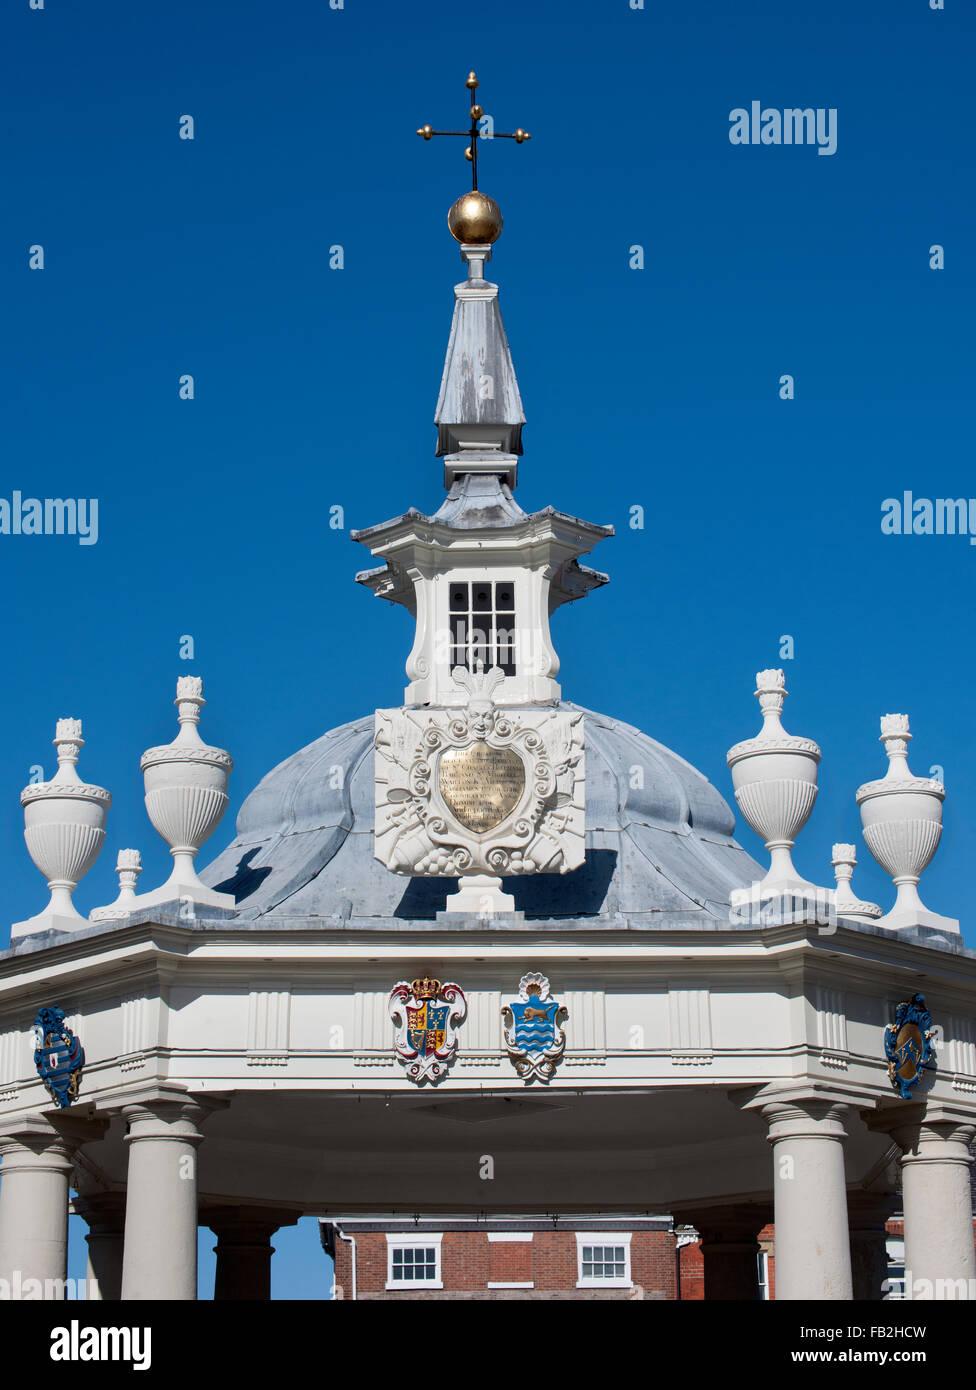 Beverley Bandstand, Market Place, Beverley, Yorkshire, England, UK. - Stock Image